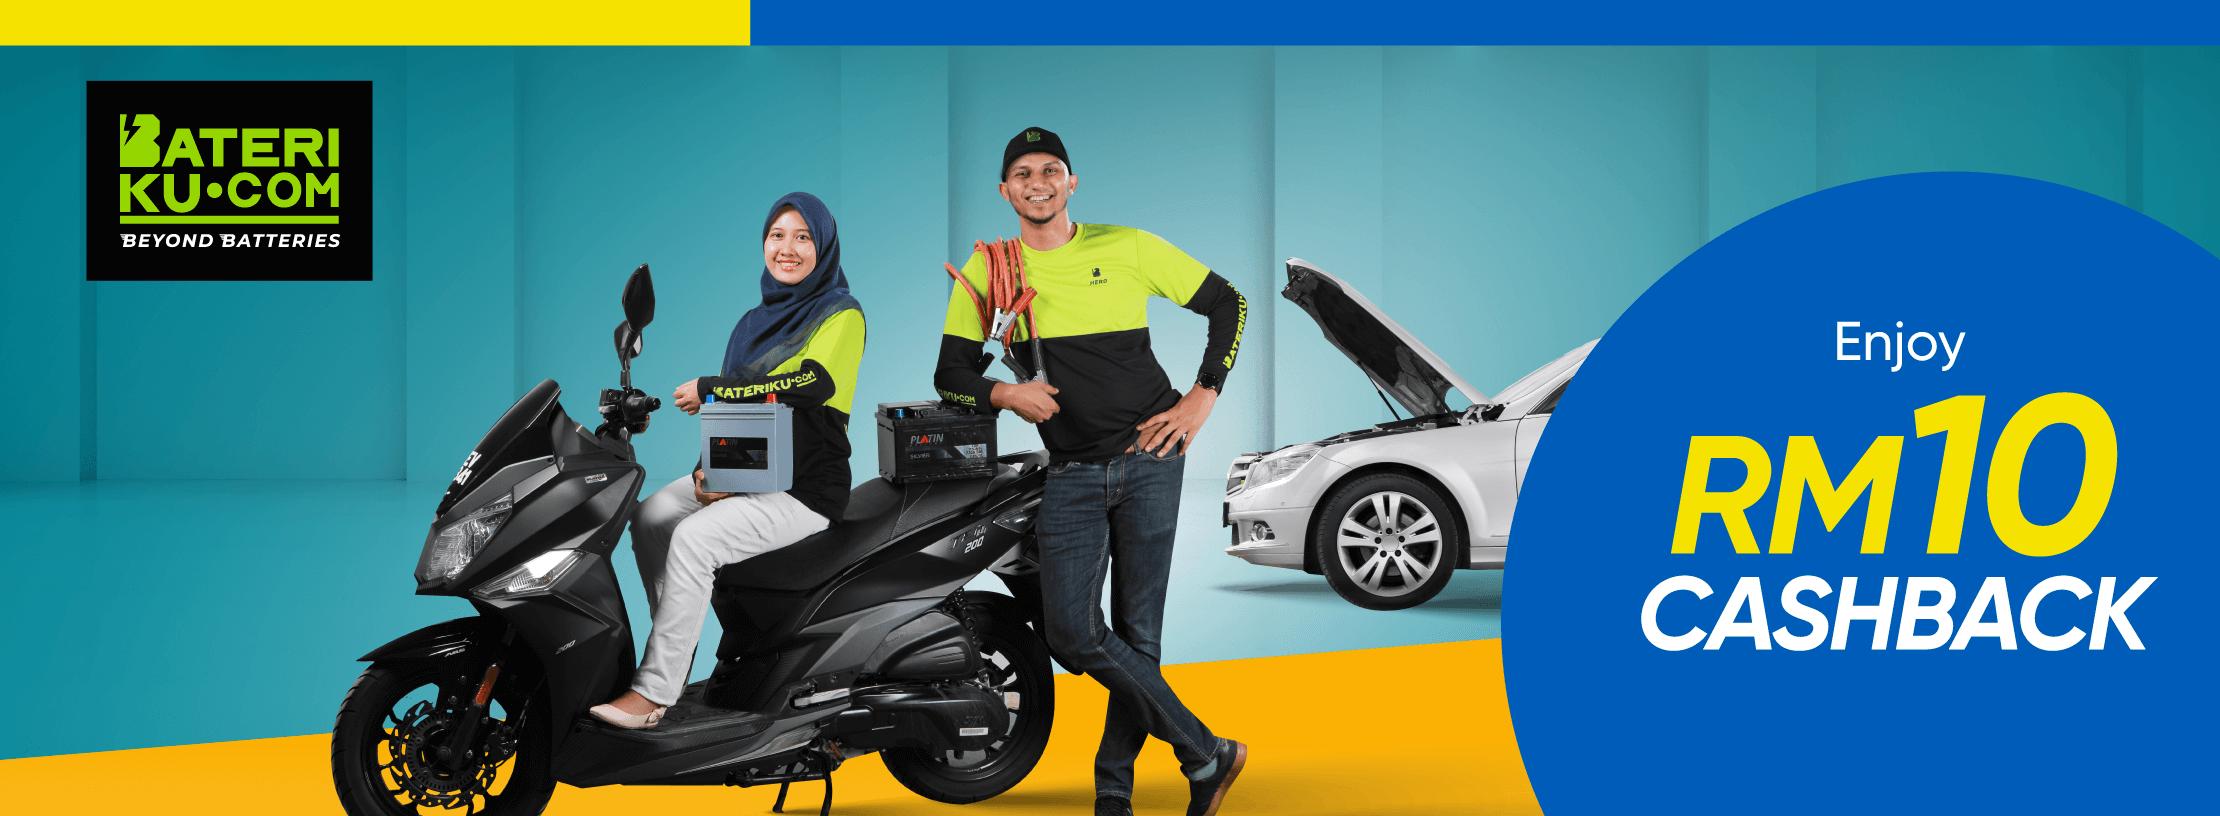 Get RM10 Cashback from Bateriku